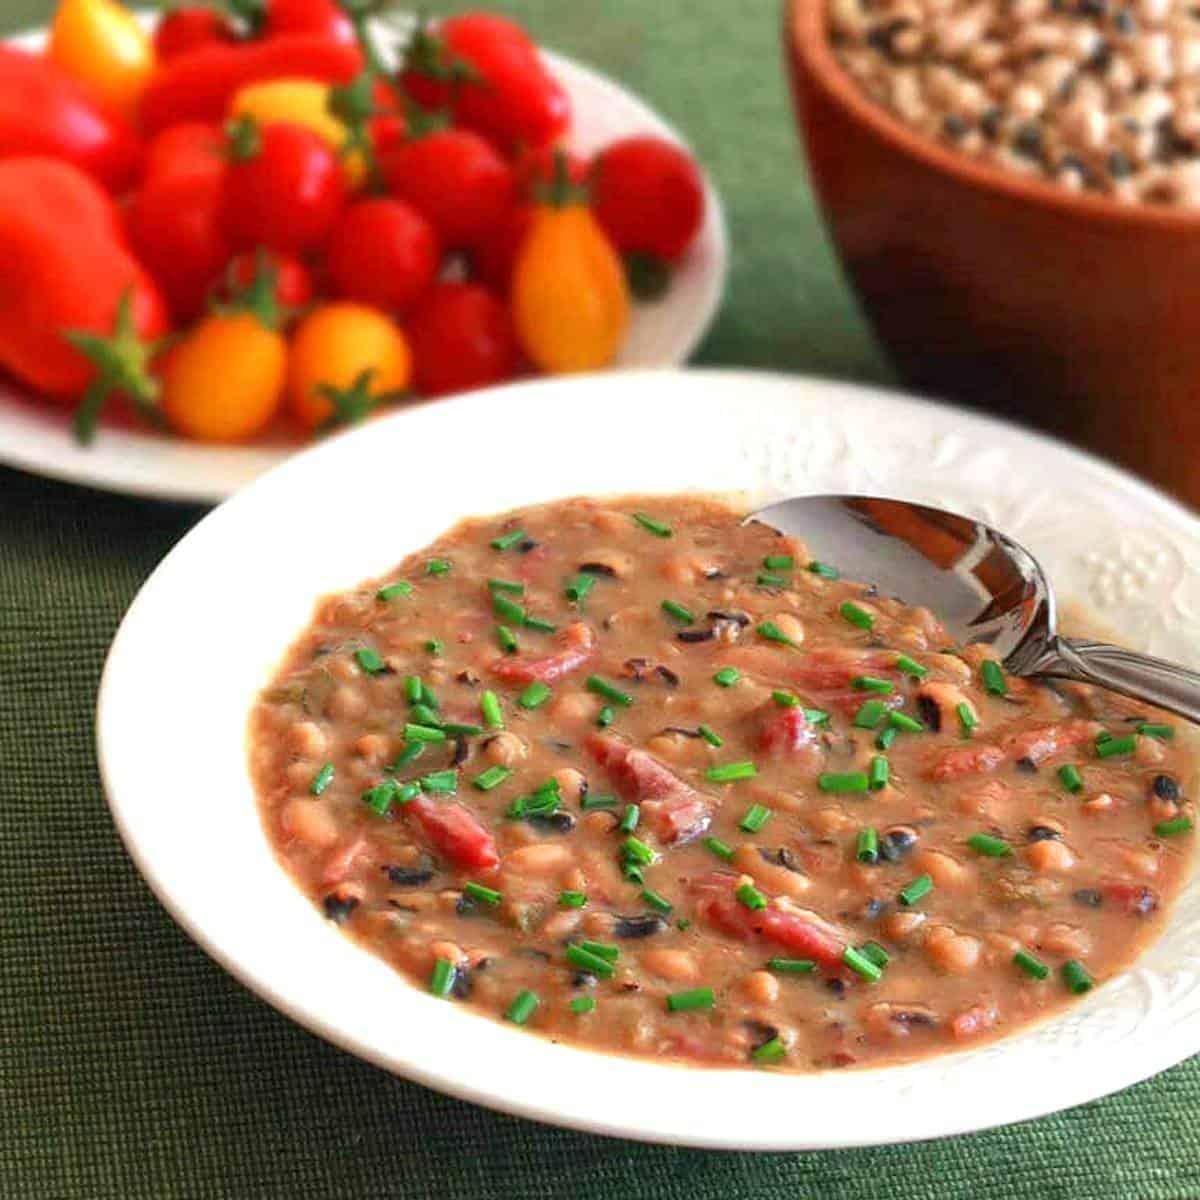 black eyed pea soup recipe smoked ham hocks peppers